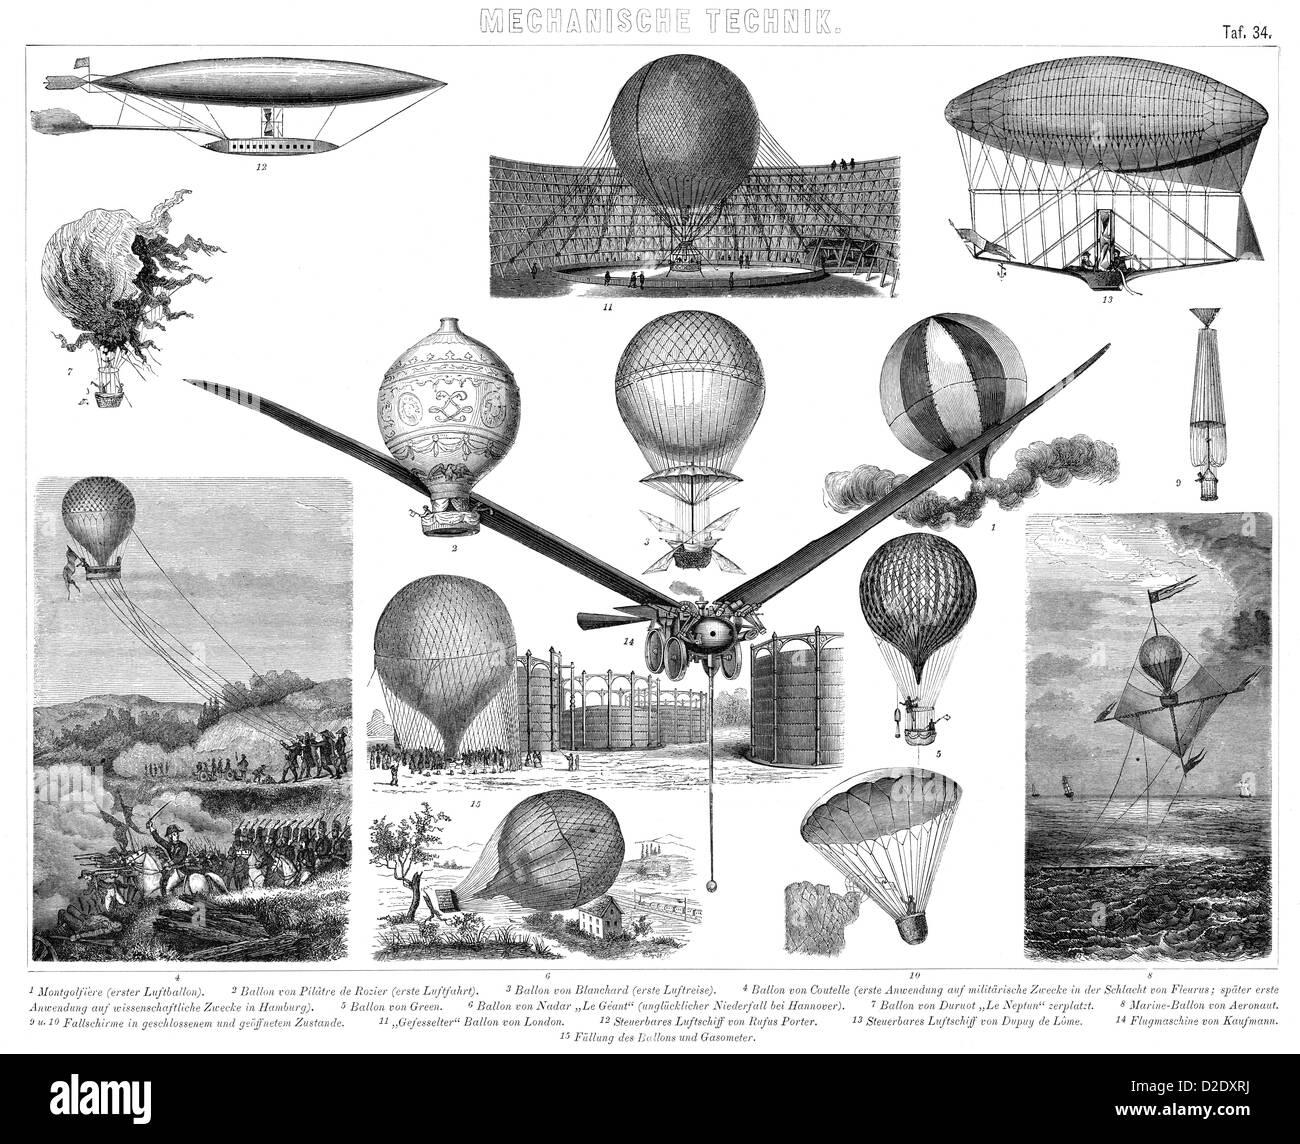 montgolfiere 19eme siecle